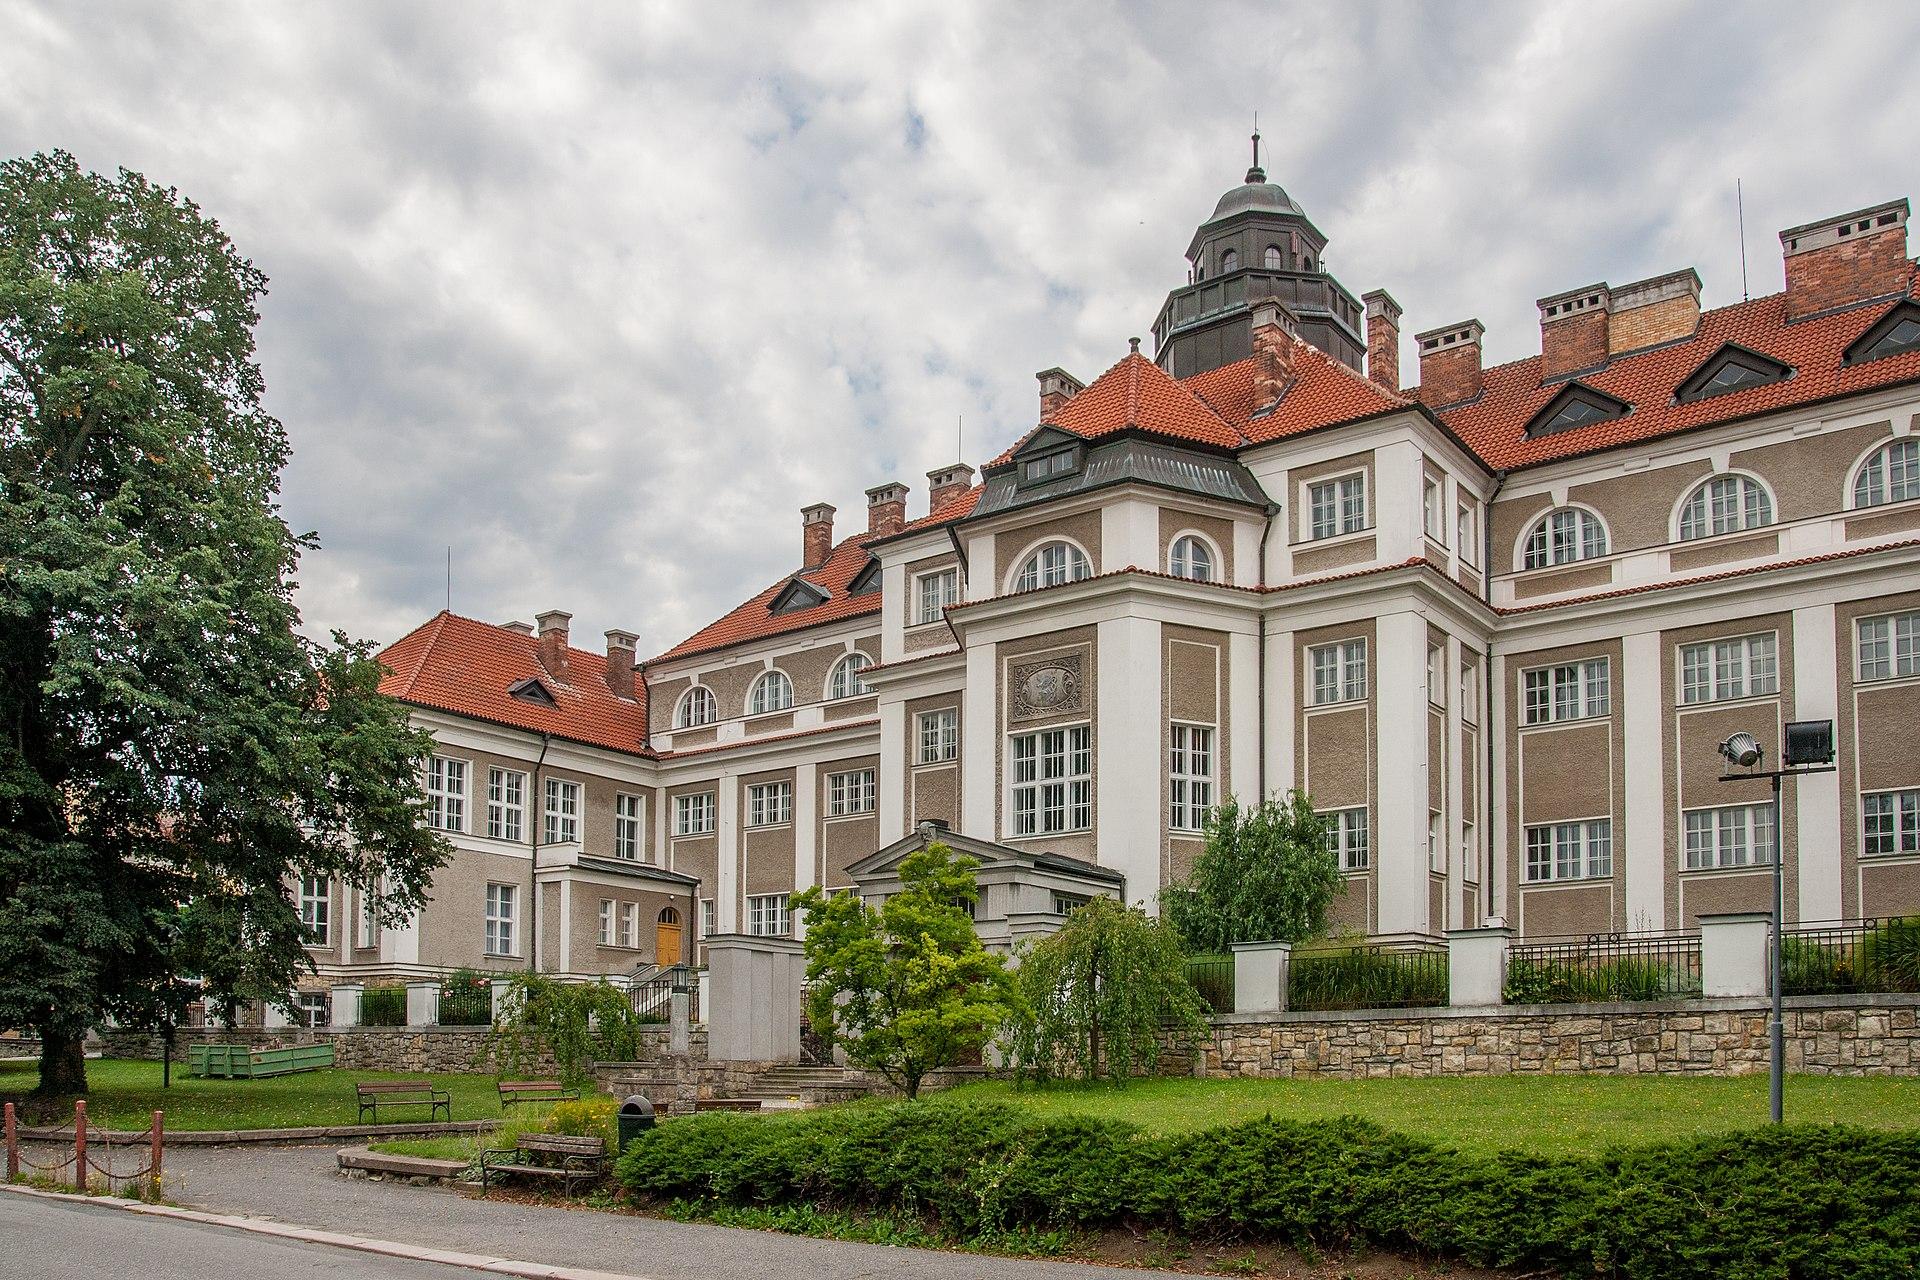 Autor: Tadeáš Bednarz – Vlastní dílo, CC BY-SA 4.0, https://commons.wikimedia.org/w/index.php?curid=81598686